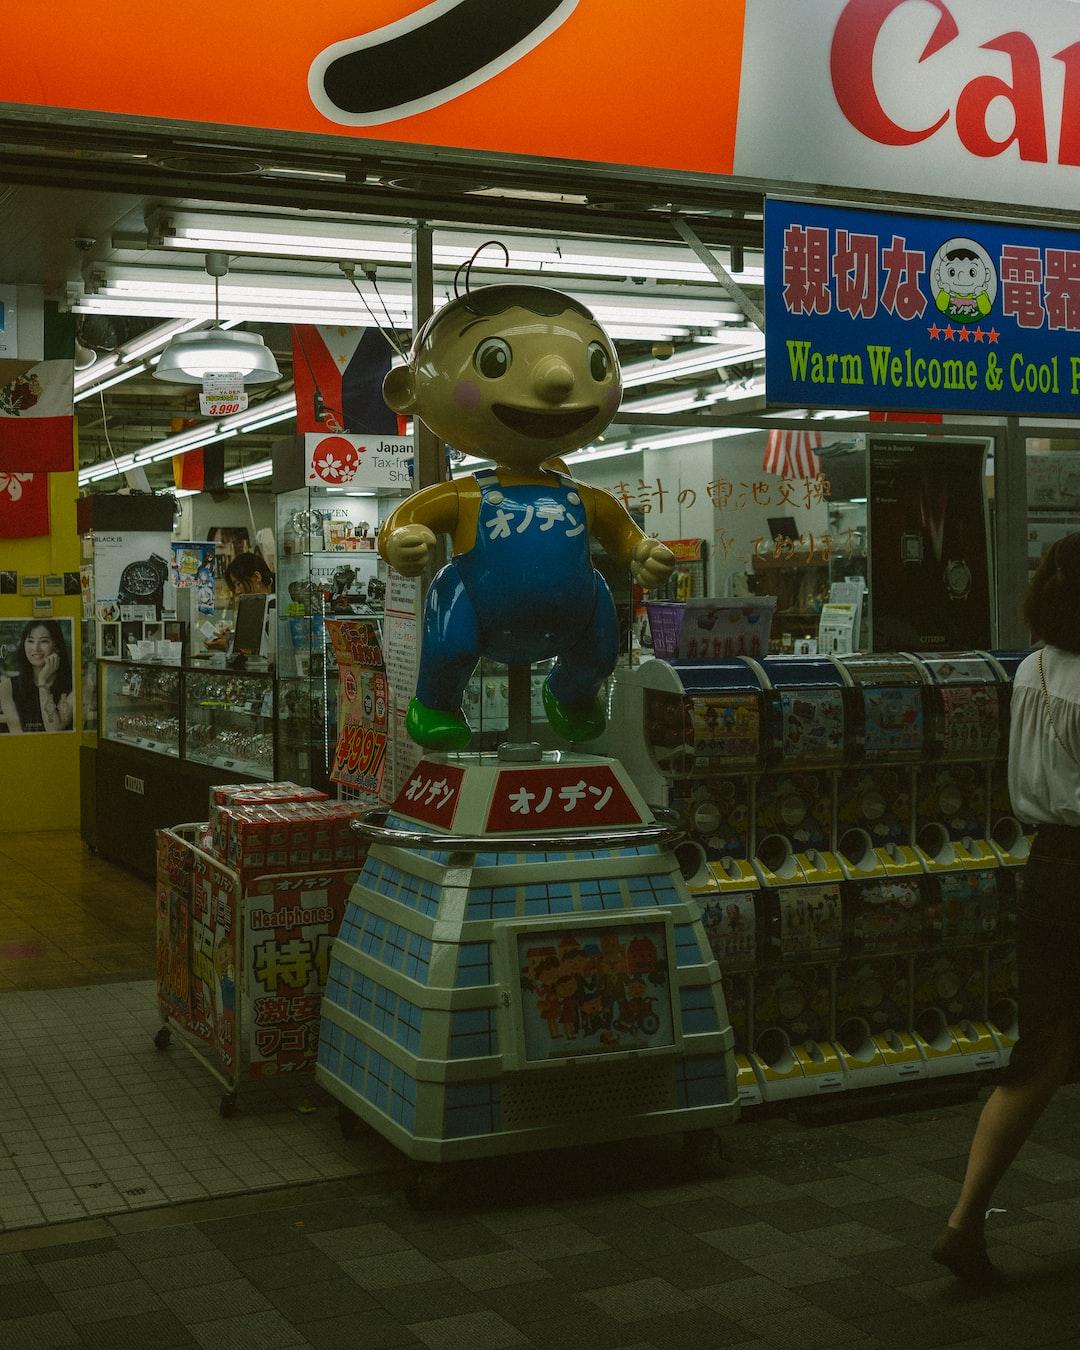 Tax free store in Akihabara, Tokyo, Japan.